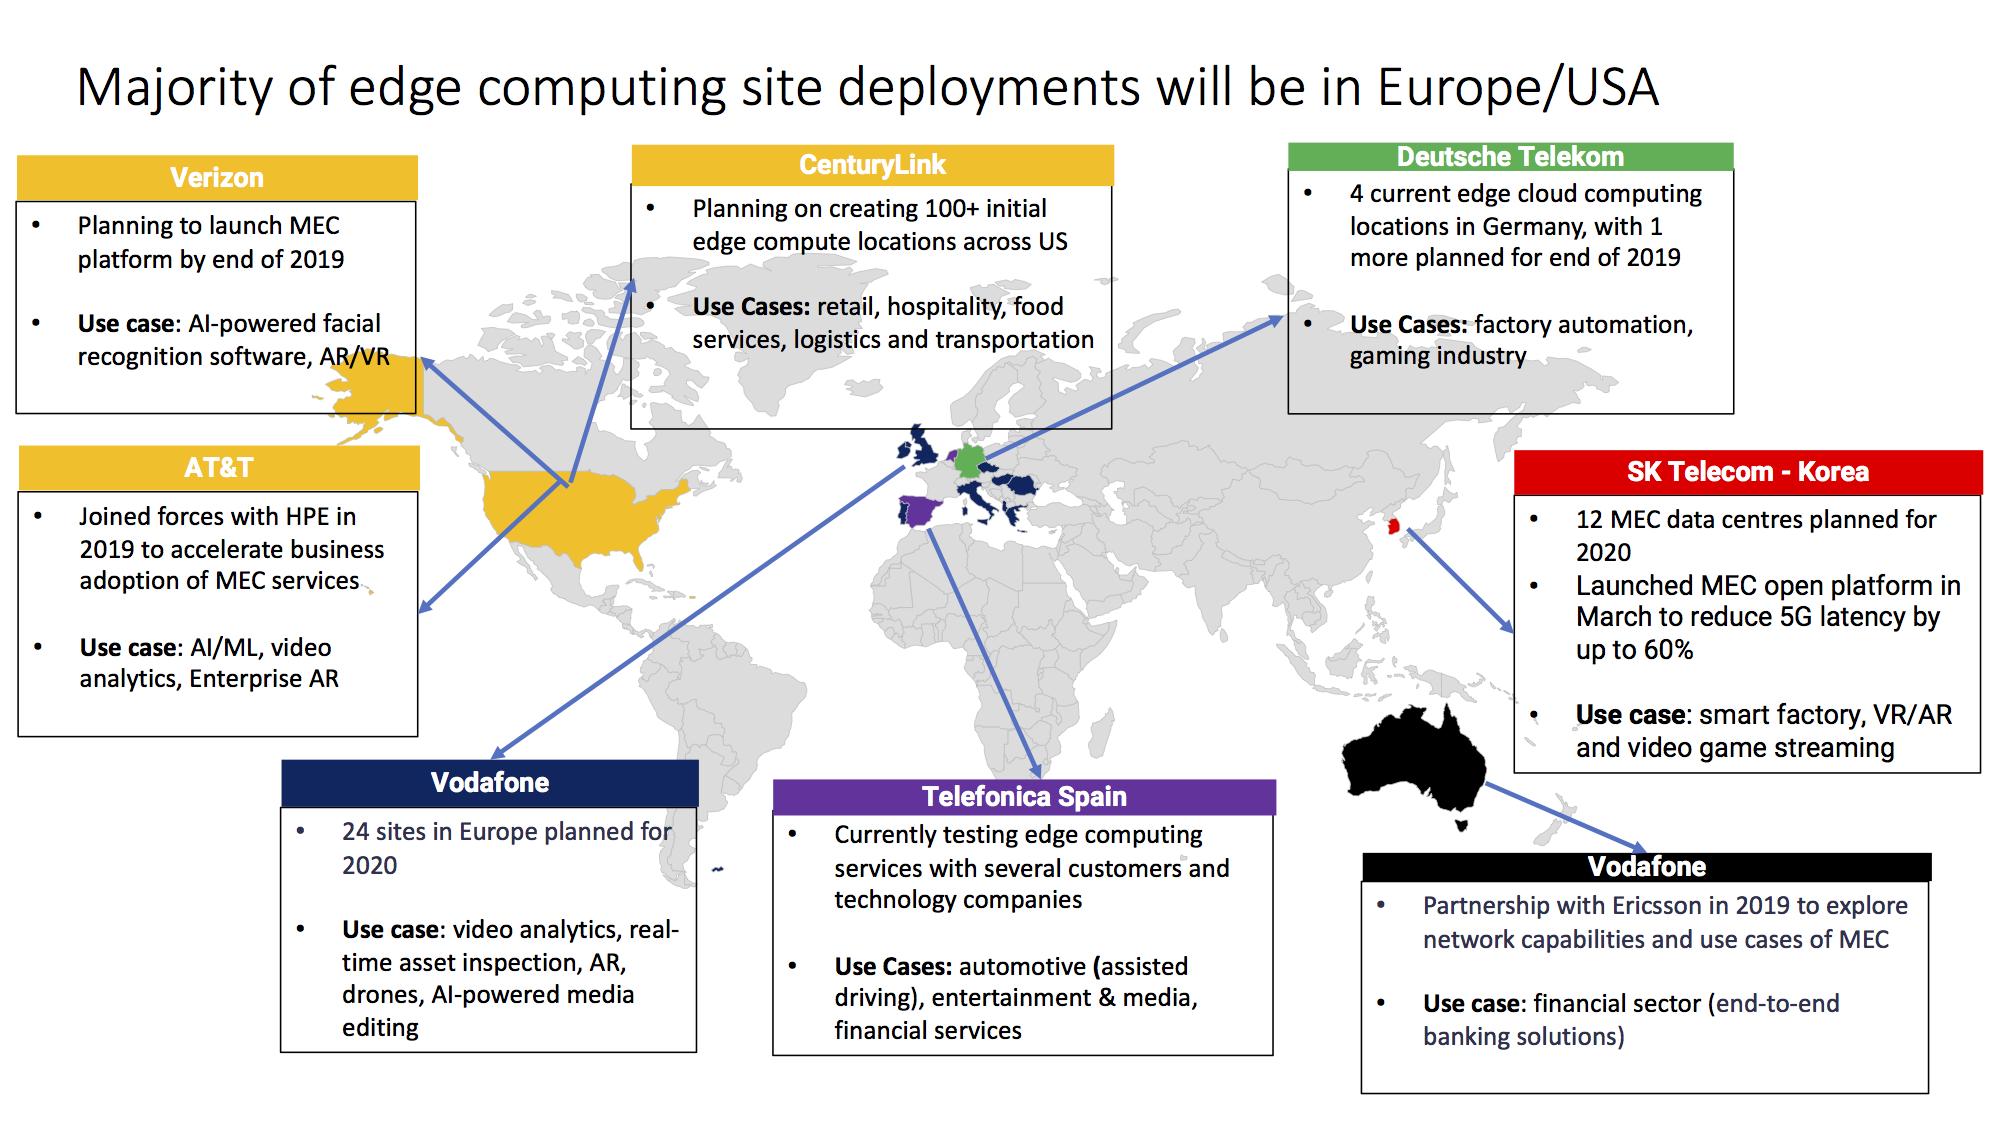 Europe USA edge computing deployments